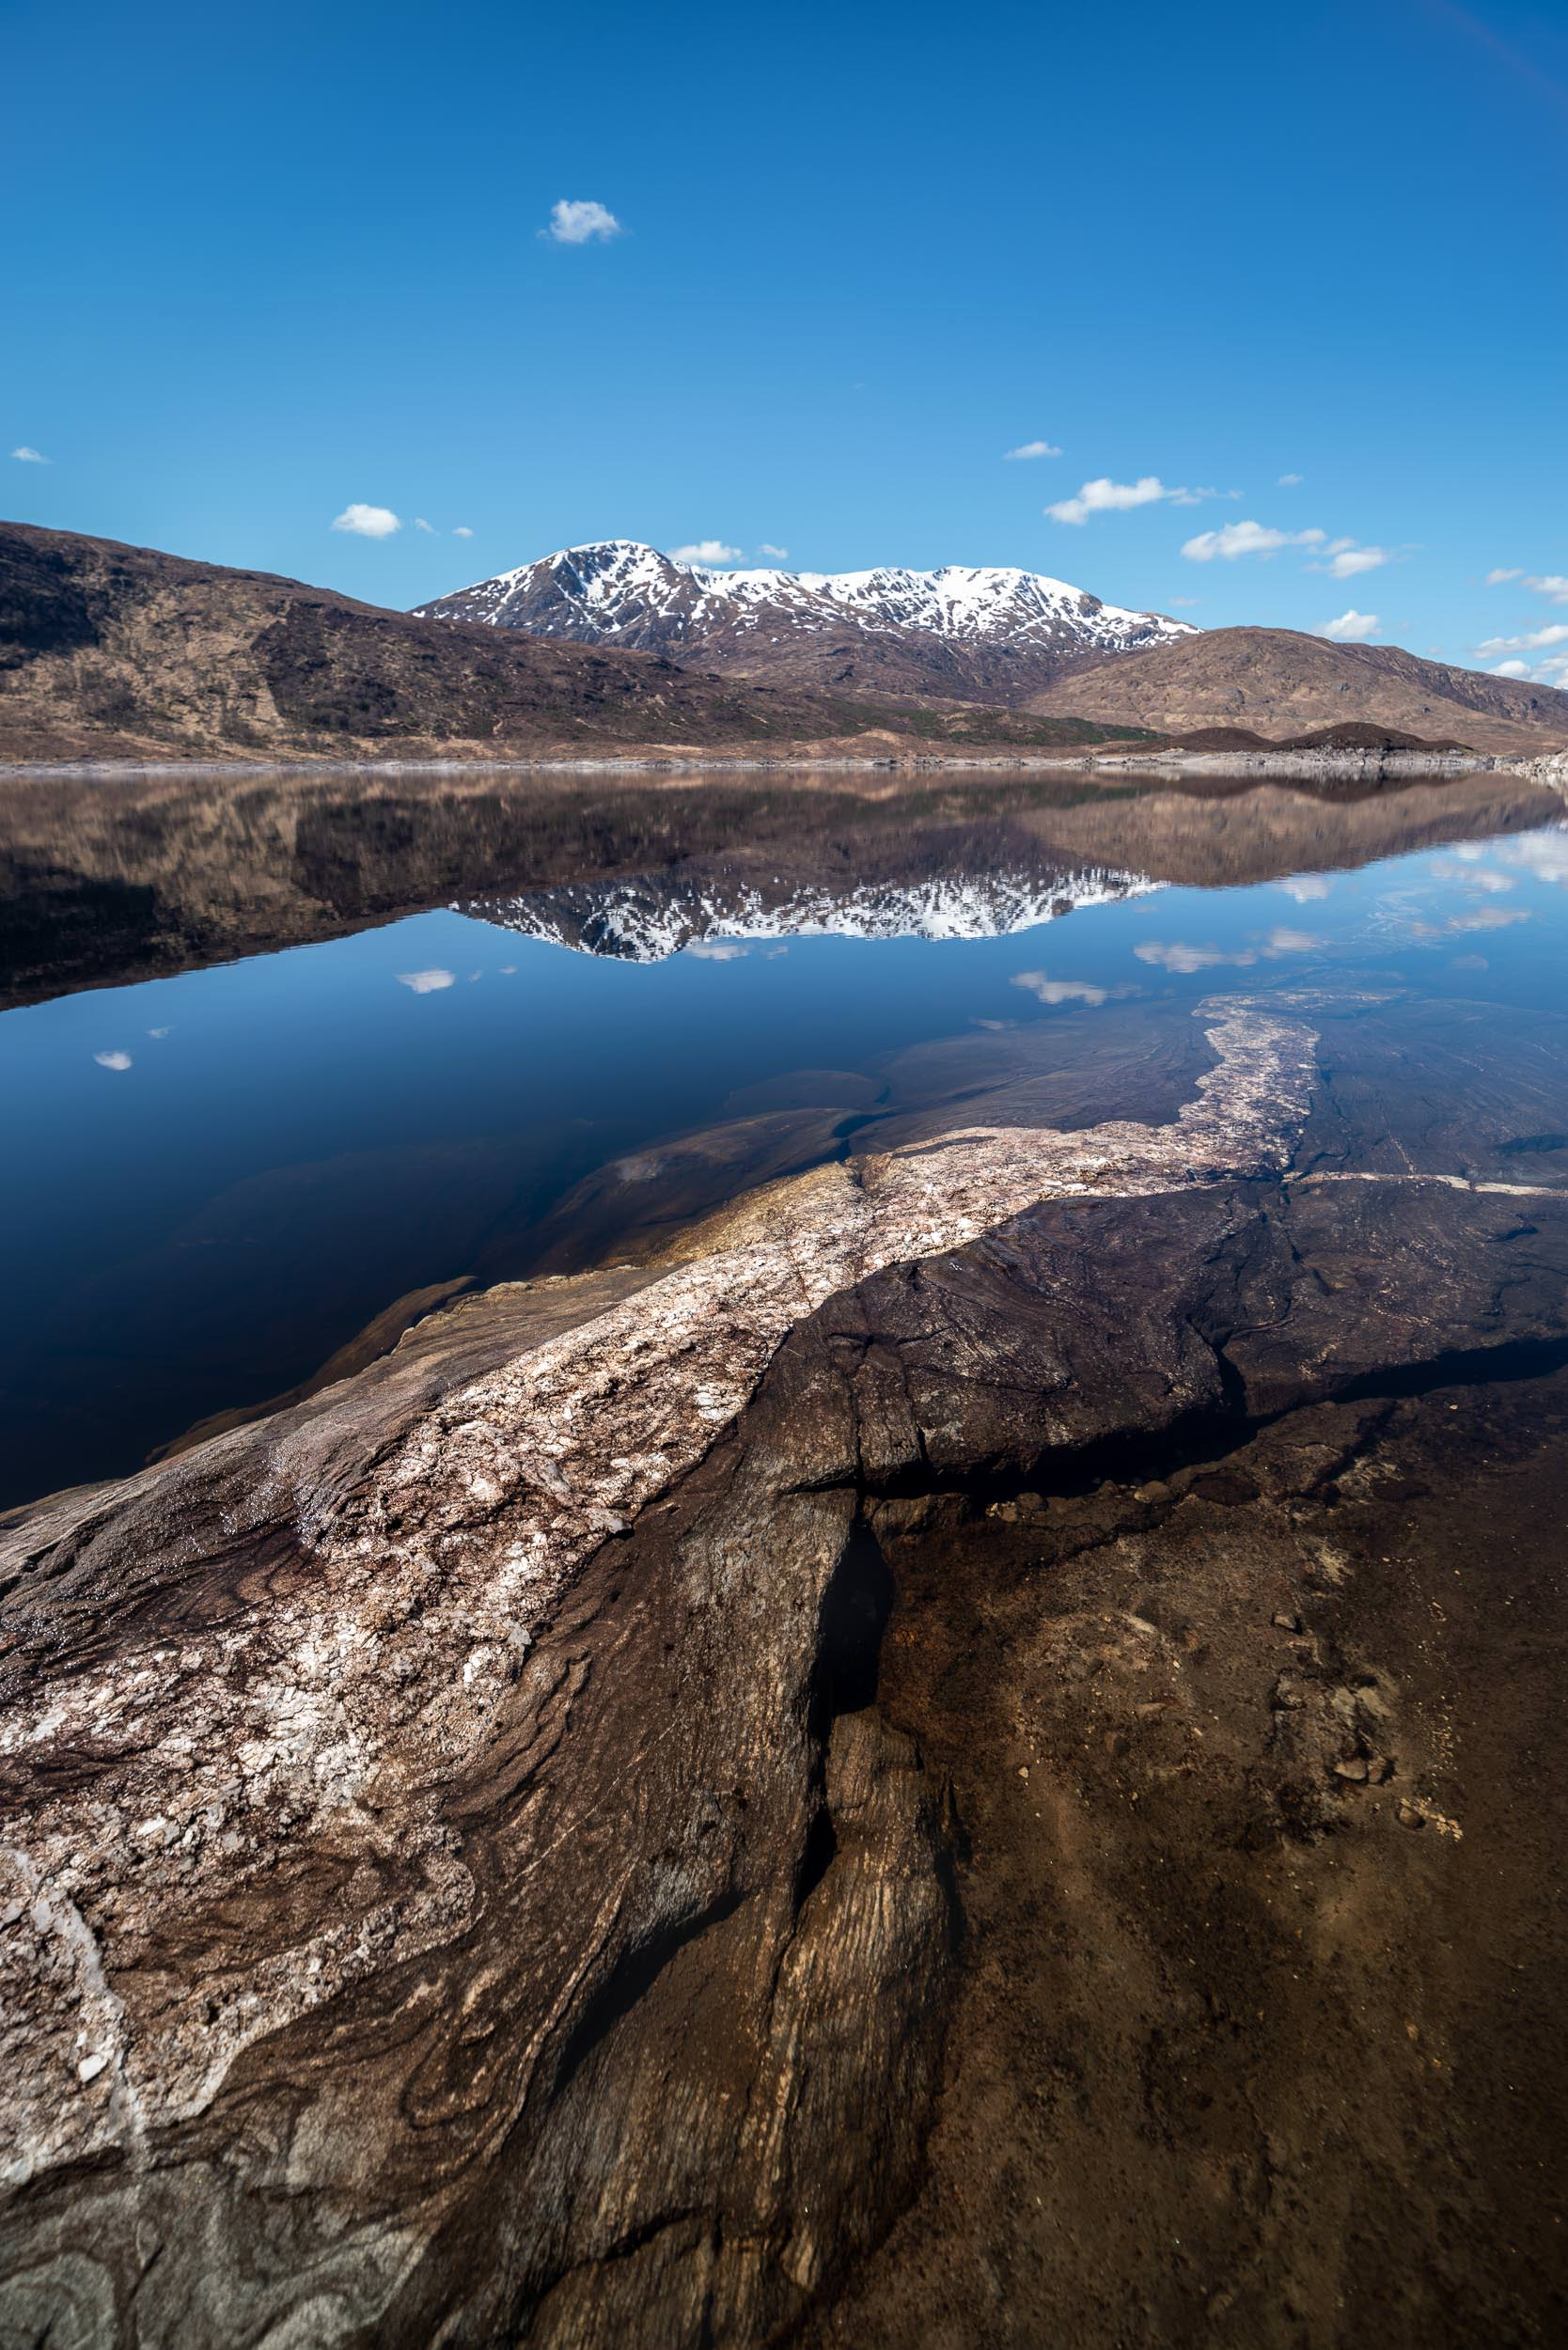 Loch Cluanie - Highlands, Scotland - Landscape Photography